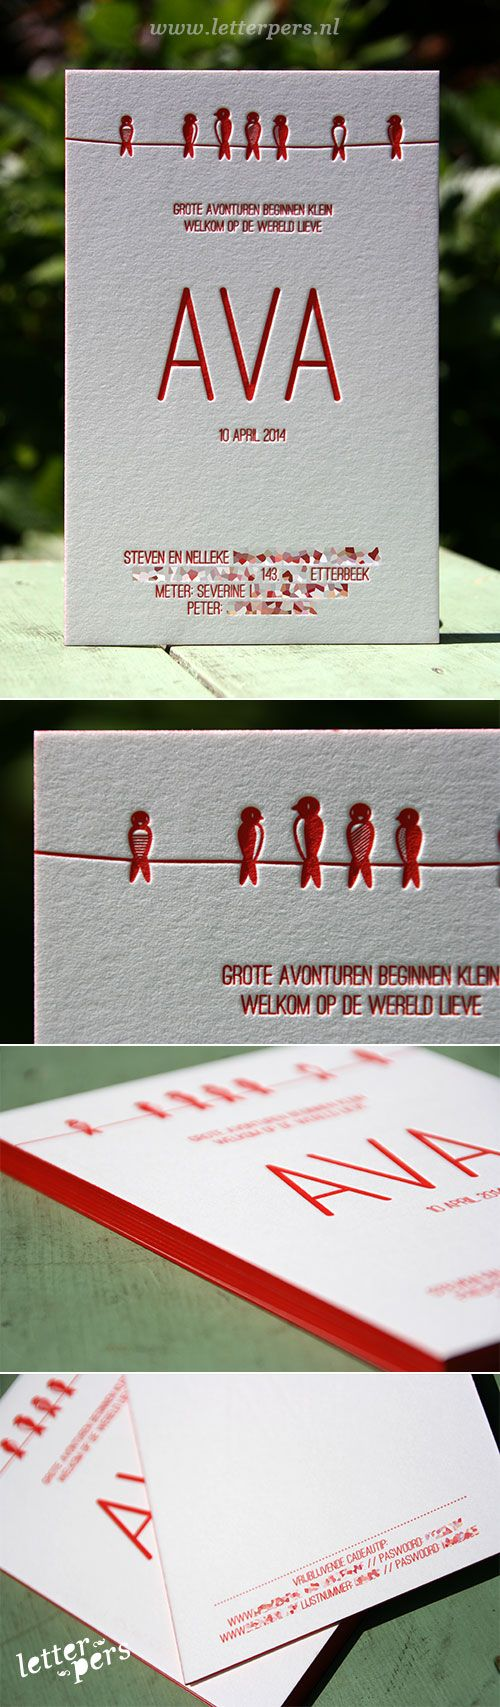 letterpers_letterpress_geboortekaartje_ava_rood_kleuropsnede_vogels_strak